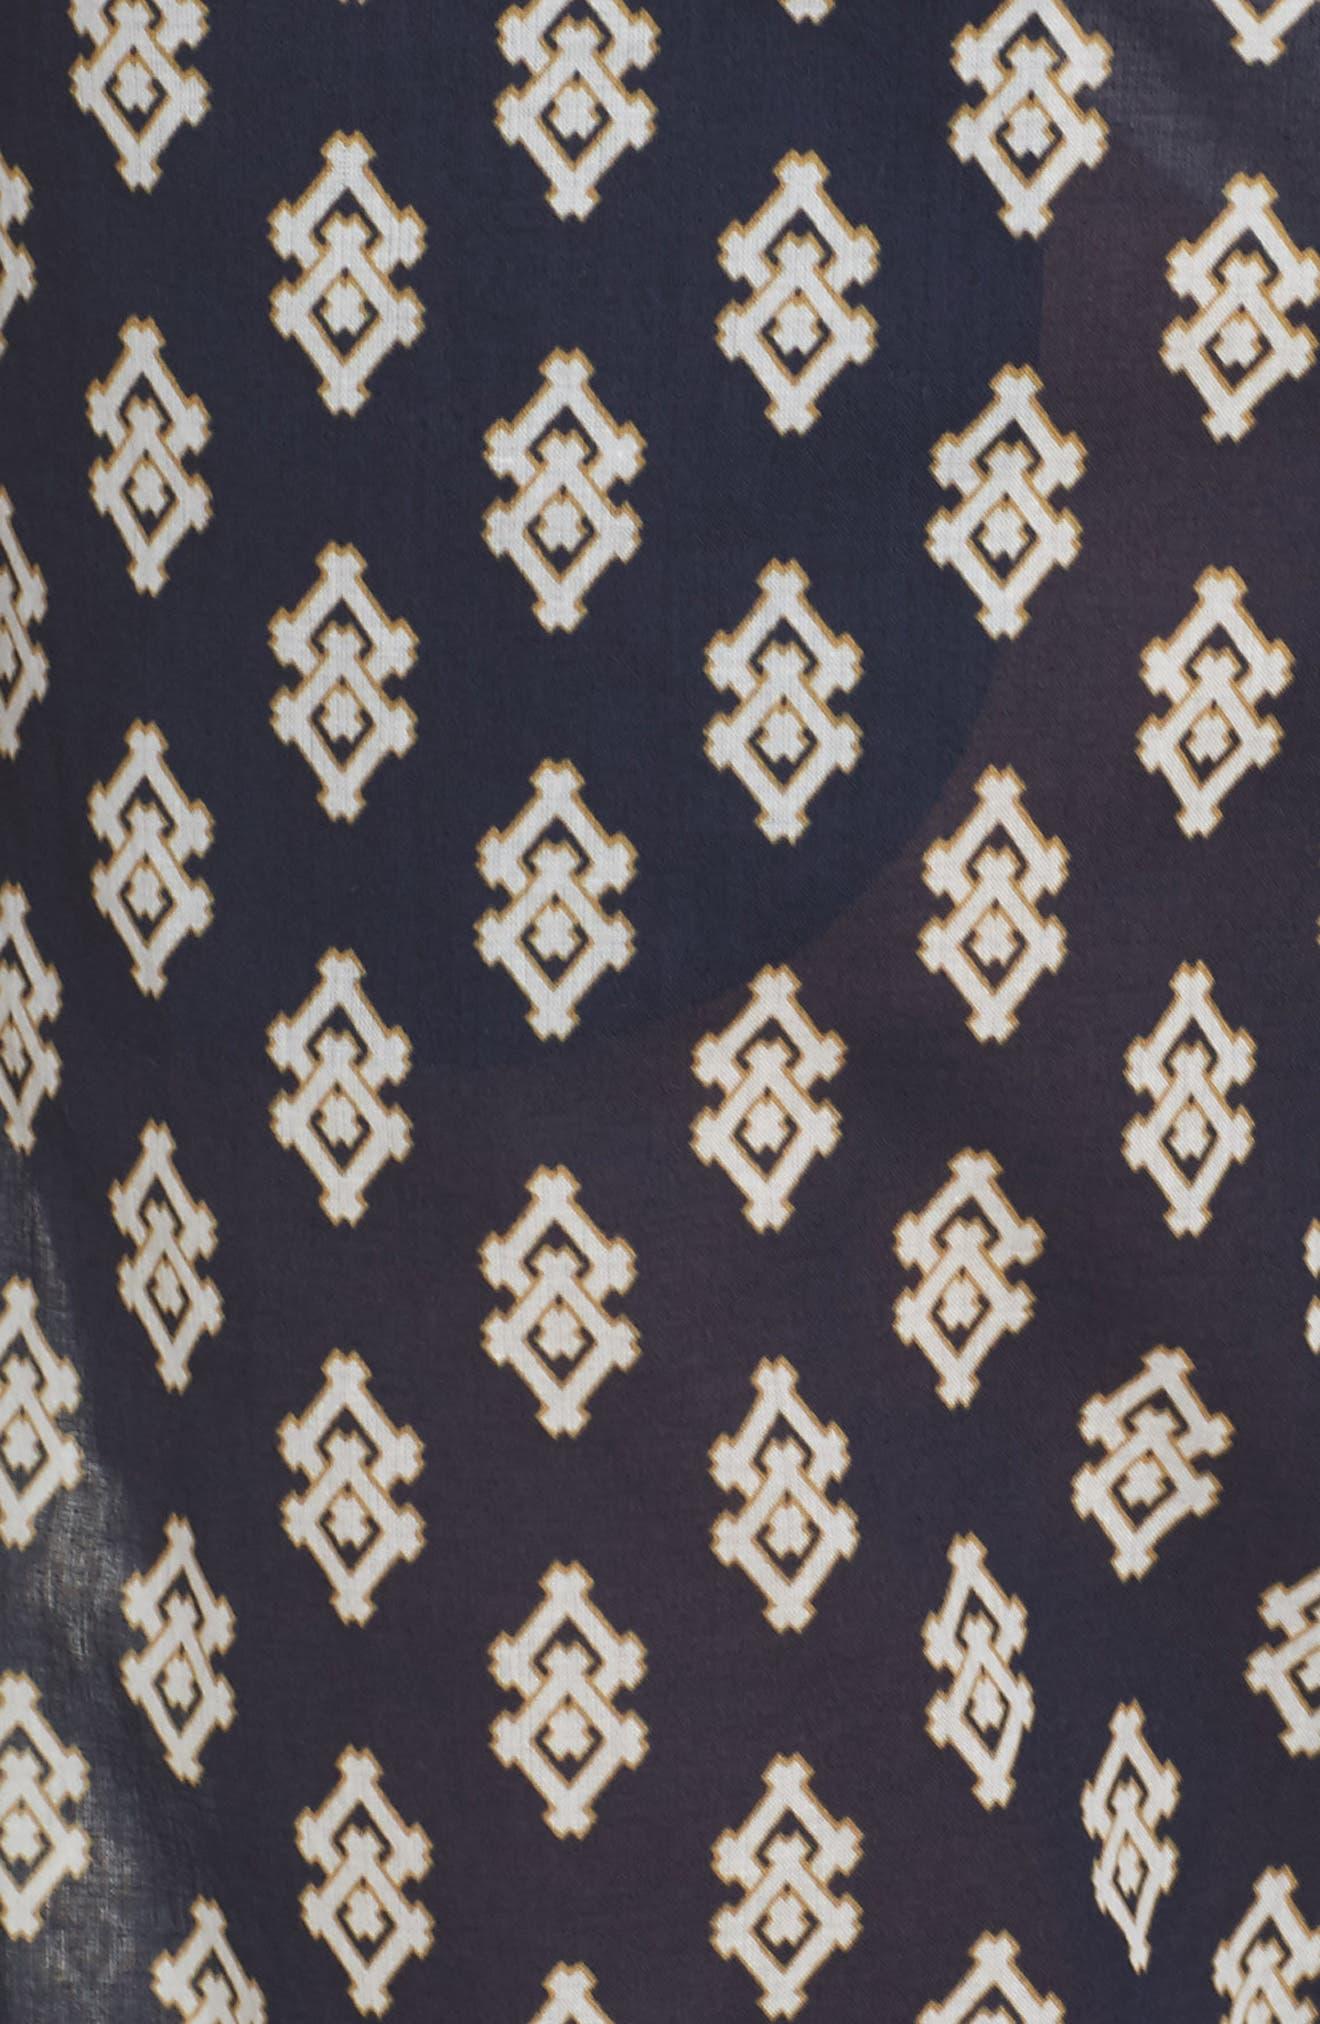 Double Diamond Cover-Up Pants,                             Alternate thumbnail 5, color,                             Tory Navy Double Diamonds